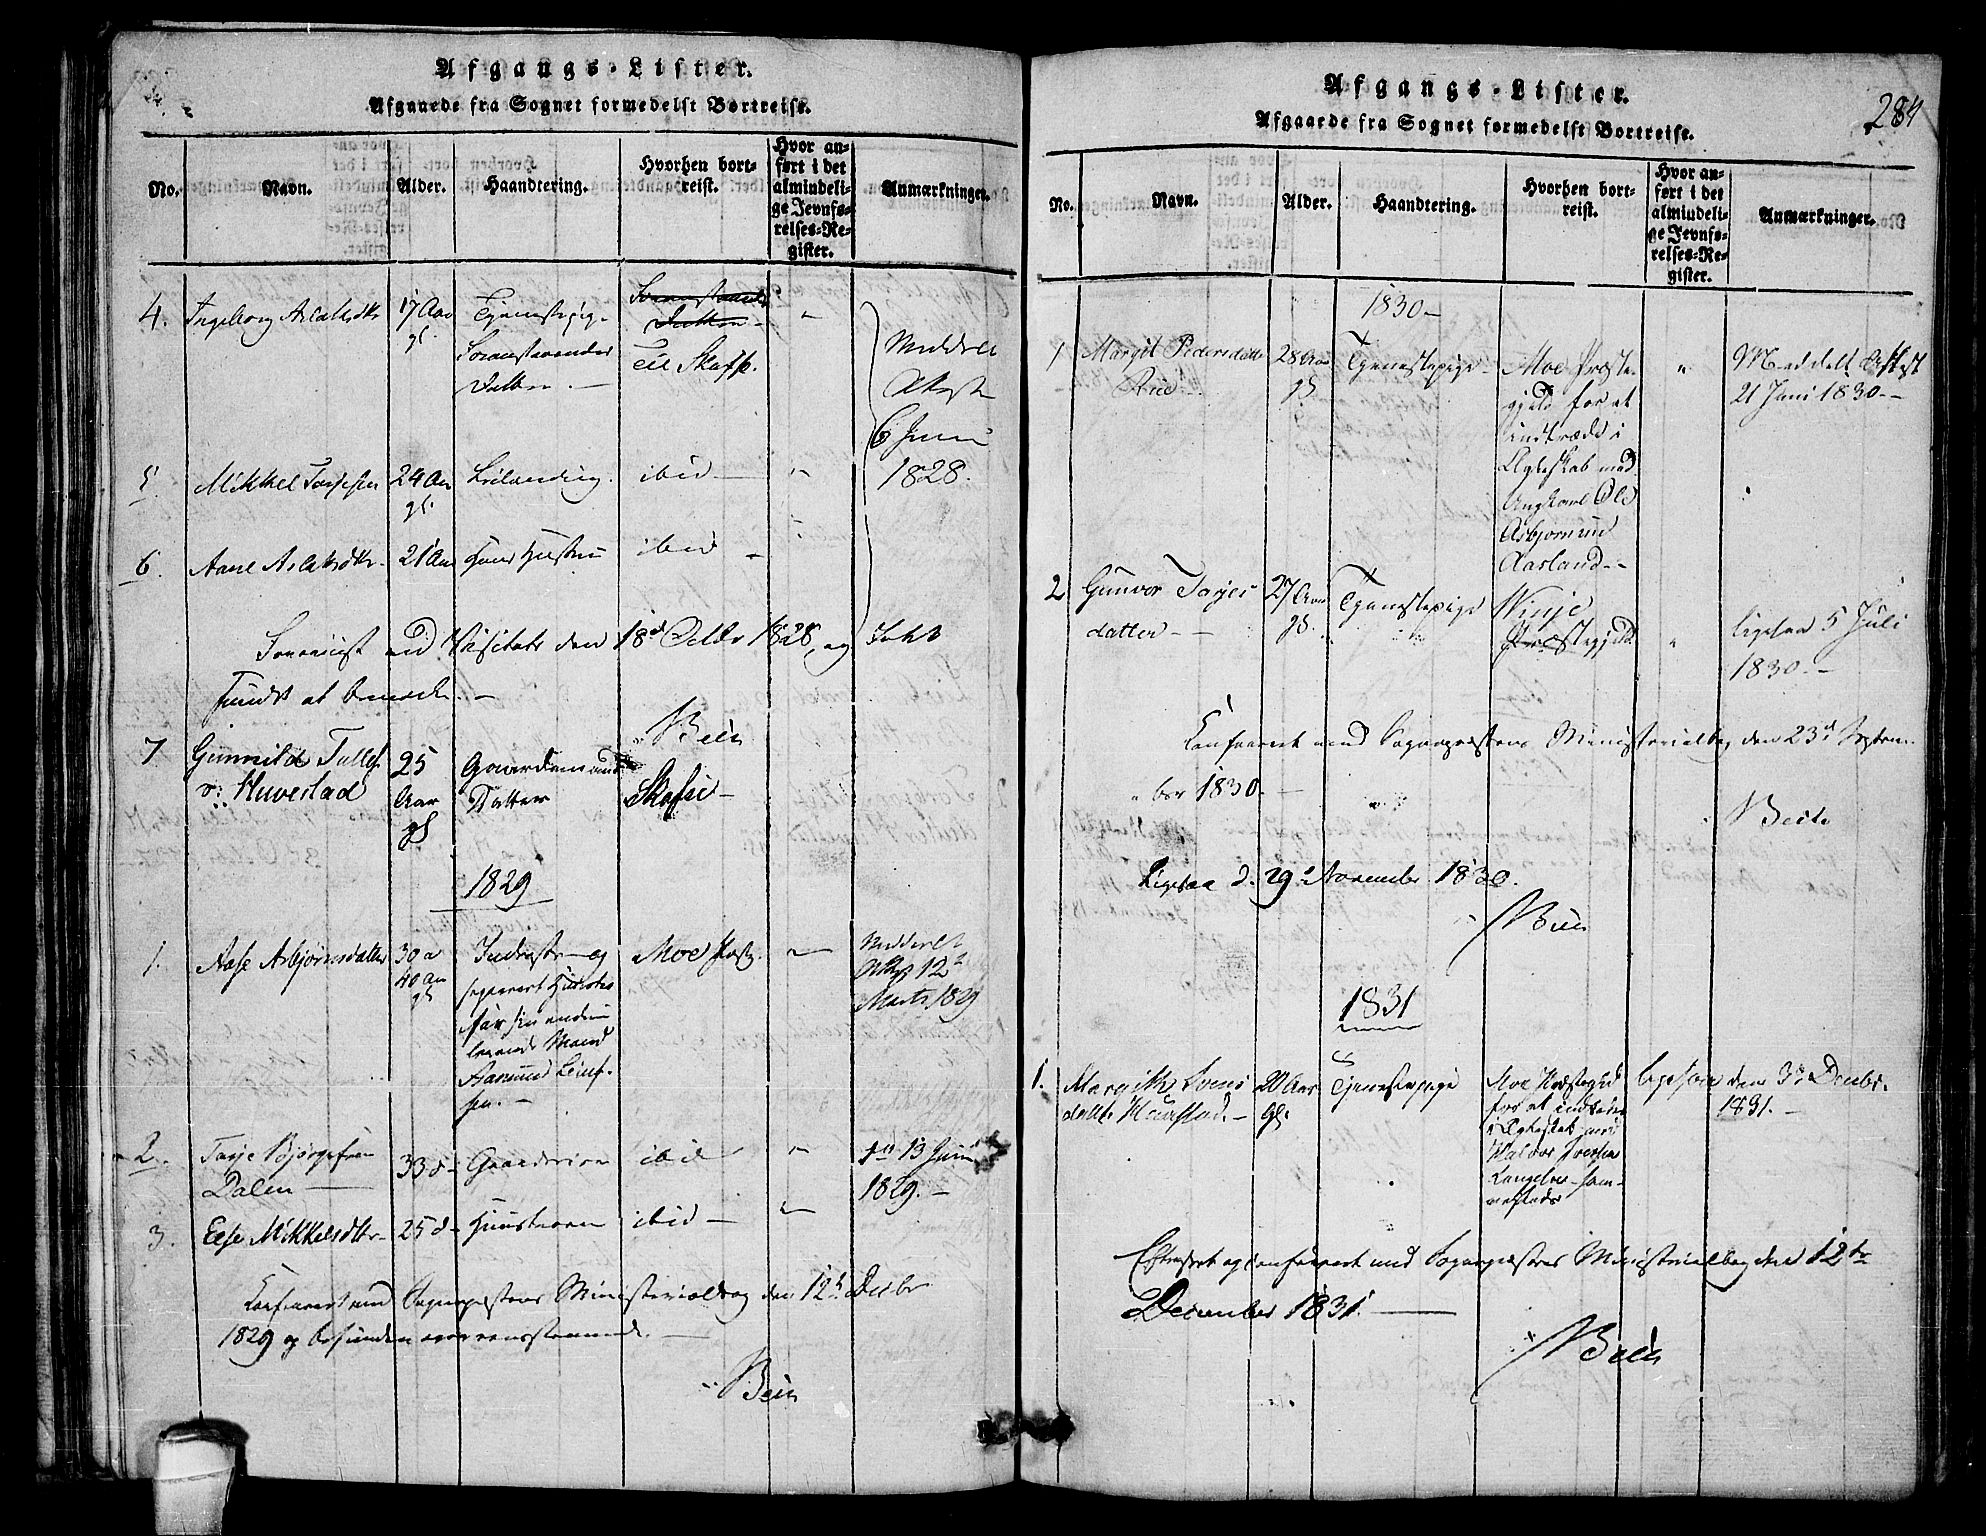 SAKO, Lårdal kirkebøker, G/Gb/L0001: Klokkerbok nr. II 1, 1815-1865, s. 284